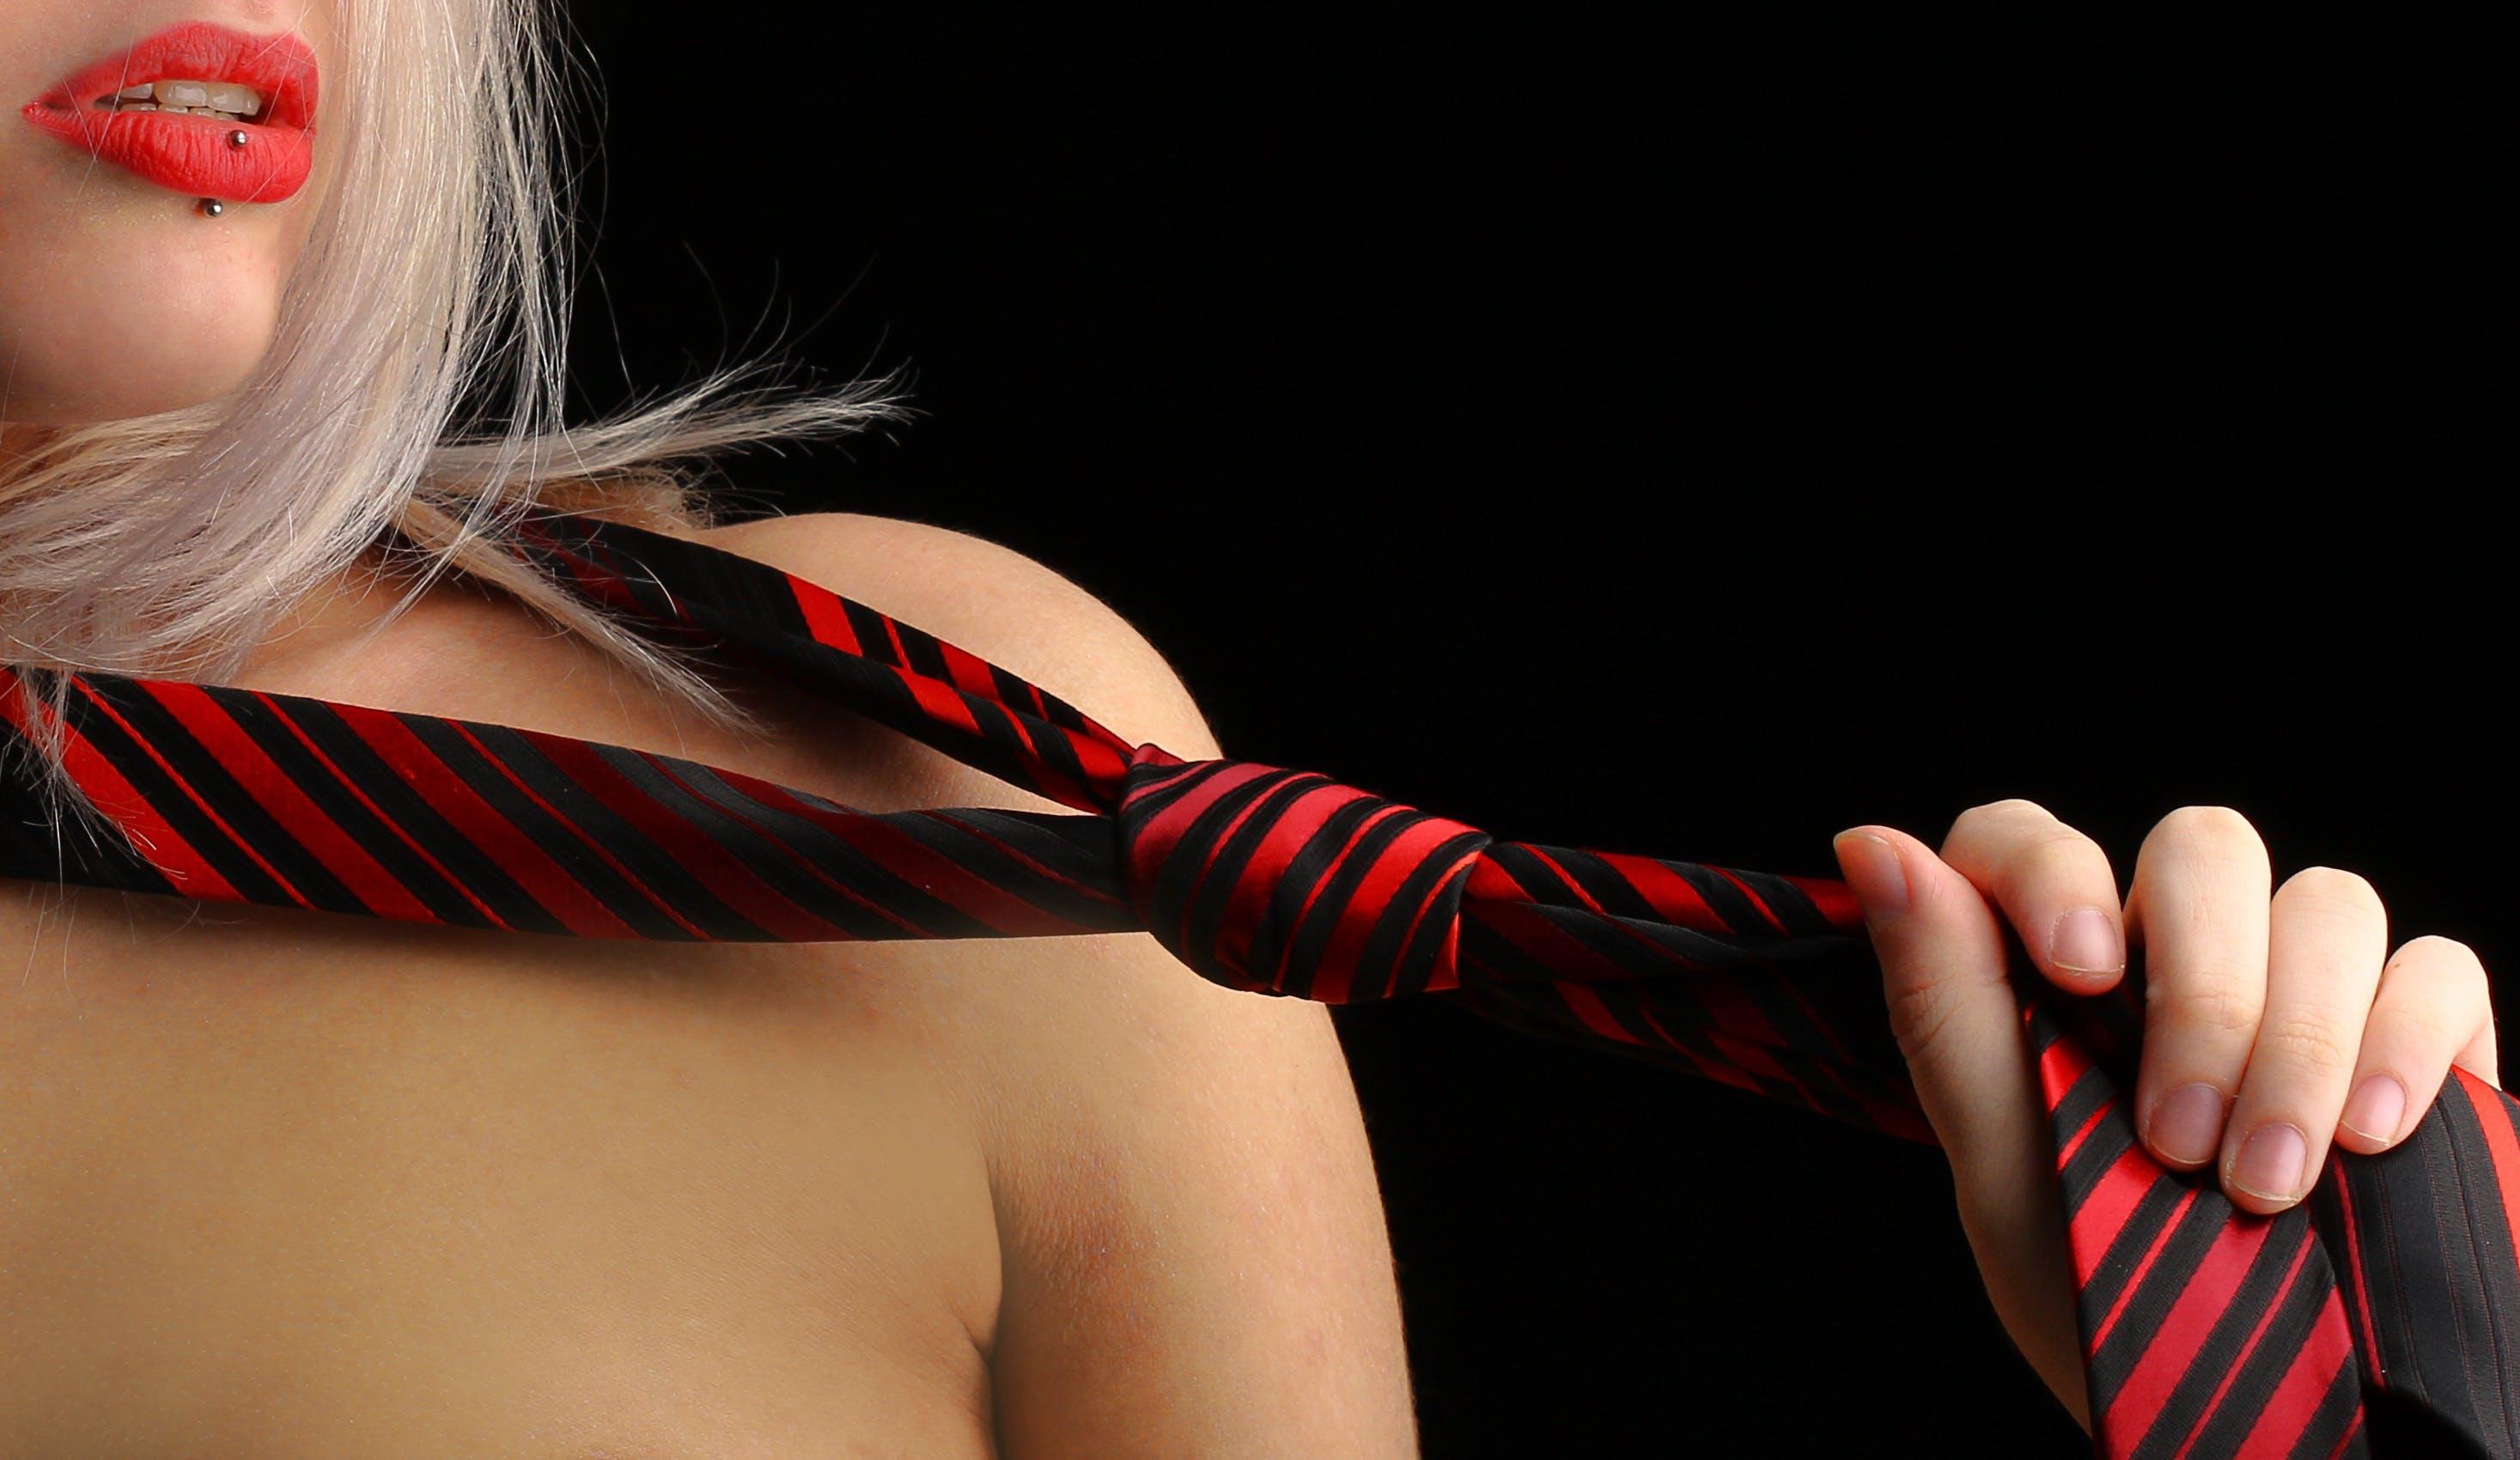 Woman Holding Necktie